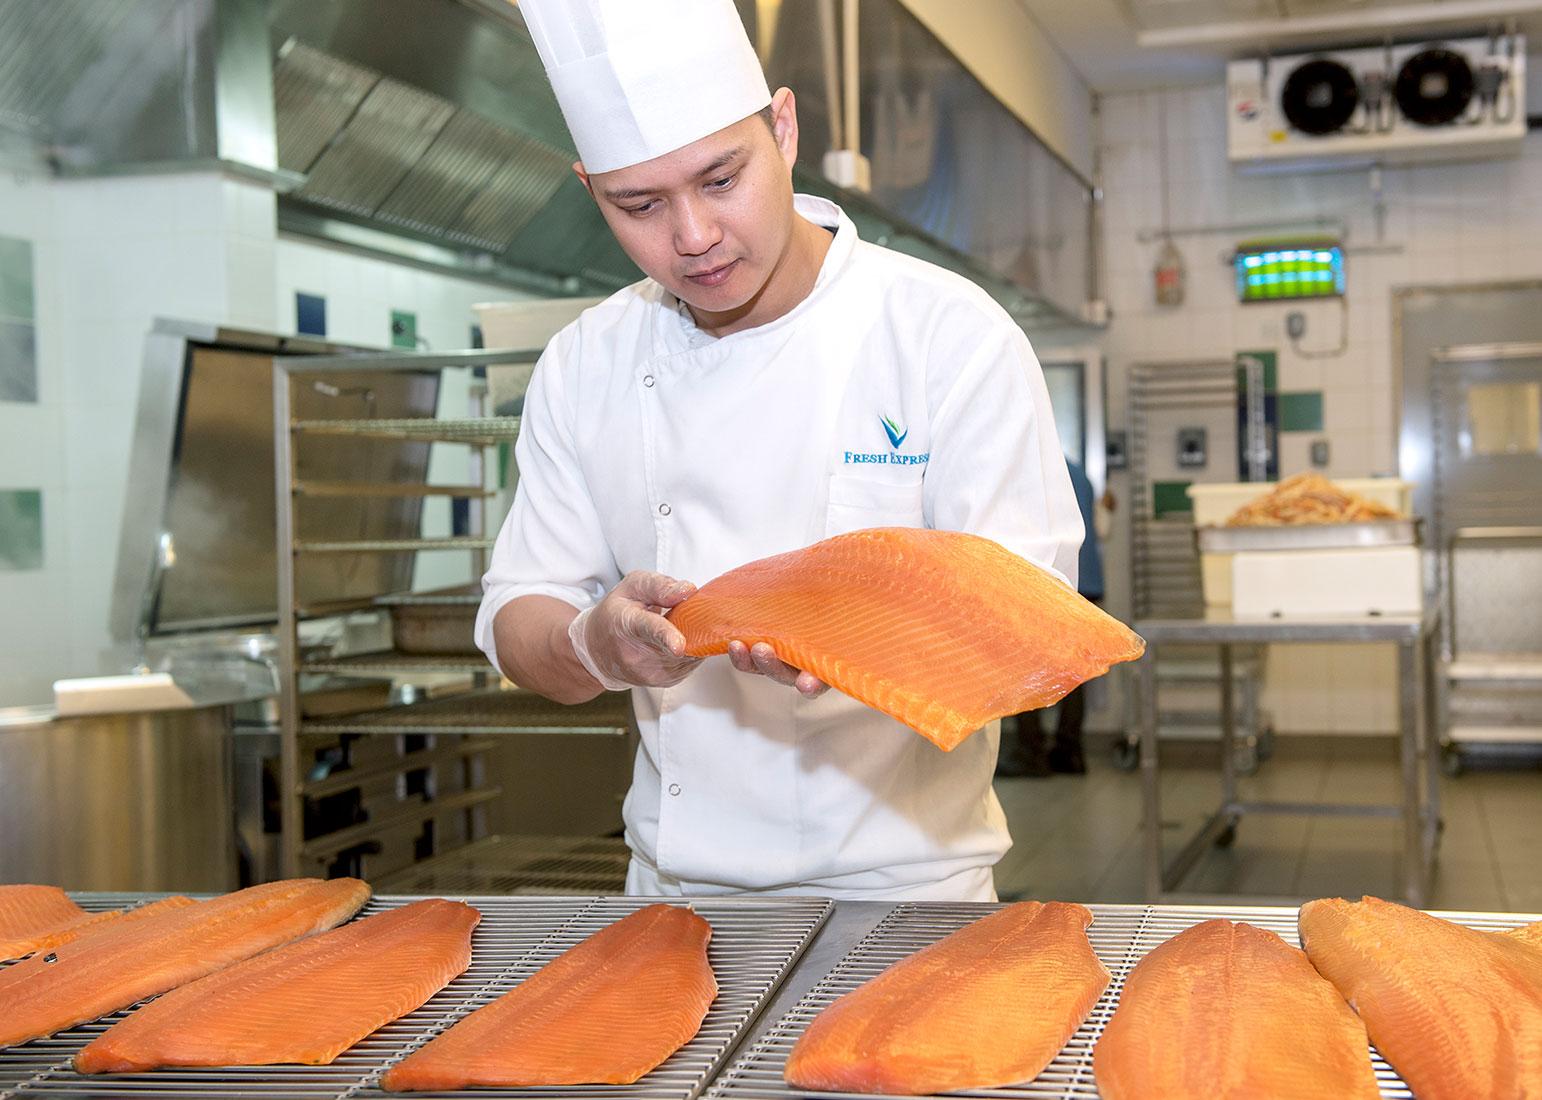 Sea Food service